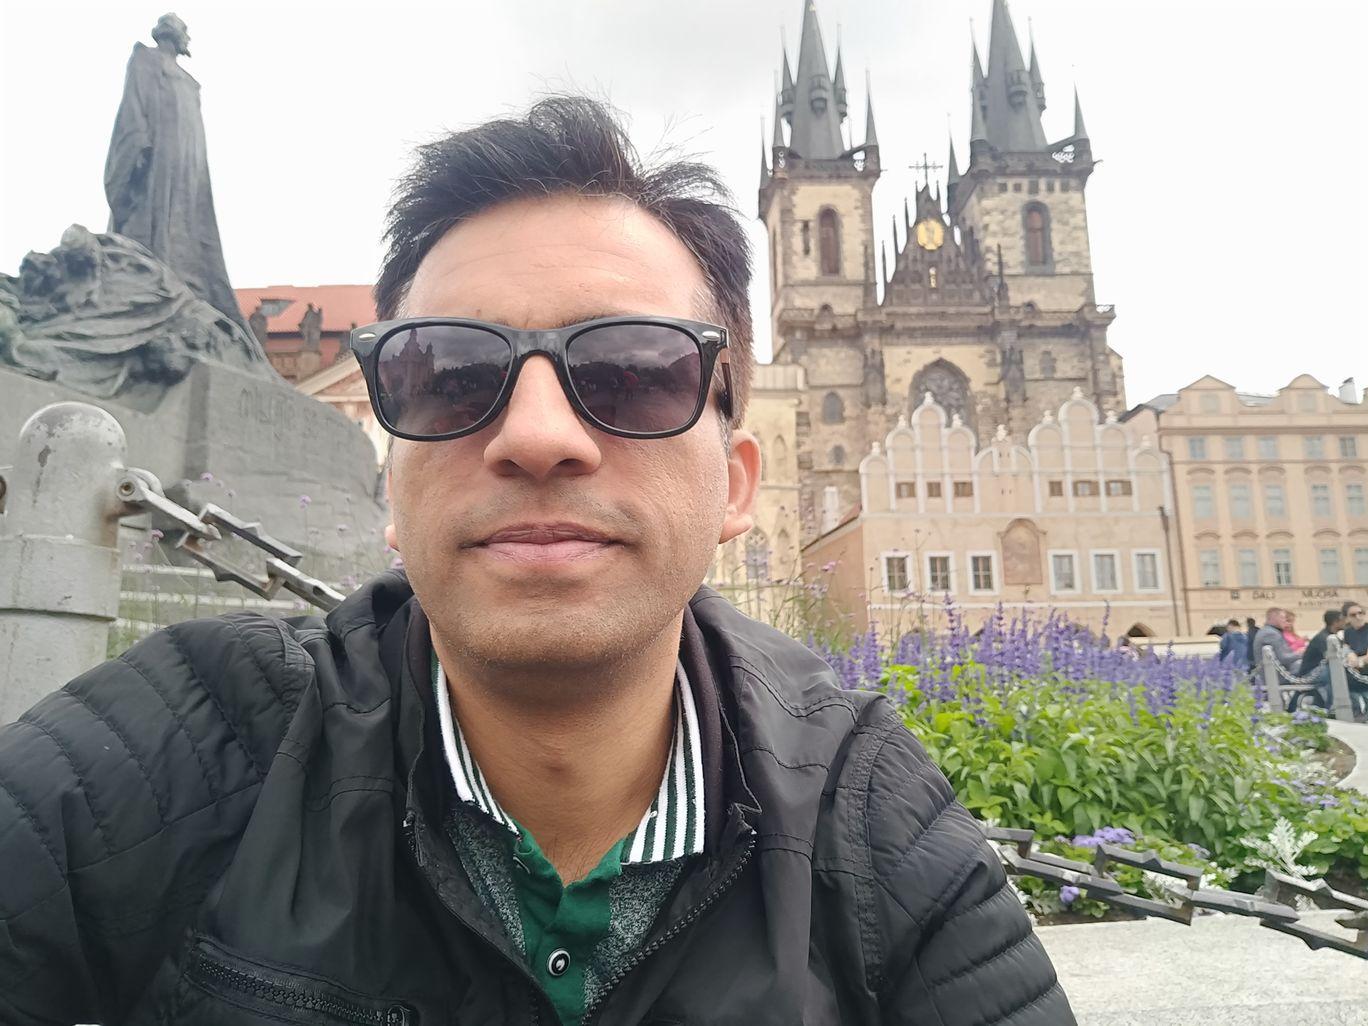 Photo of Prague By Gaurav Ahuja